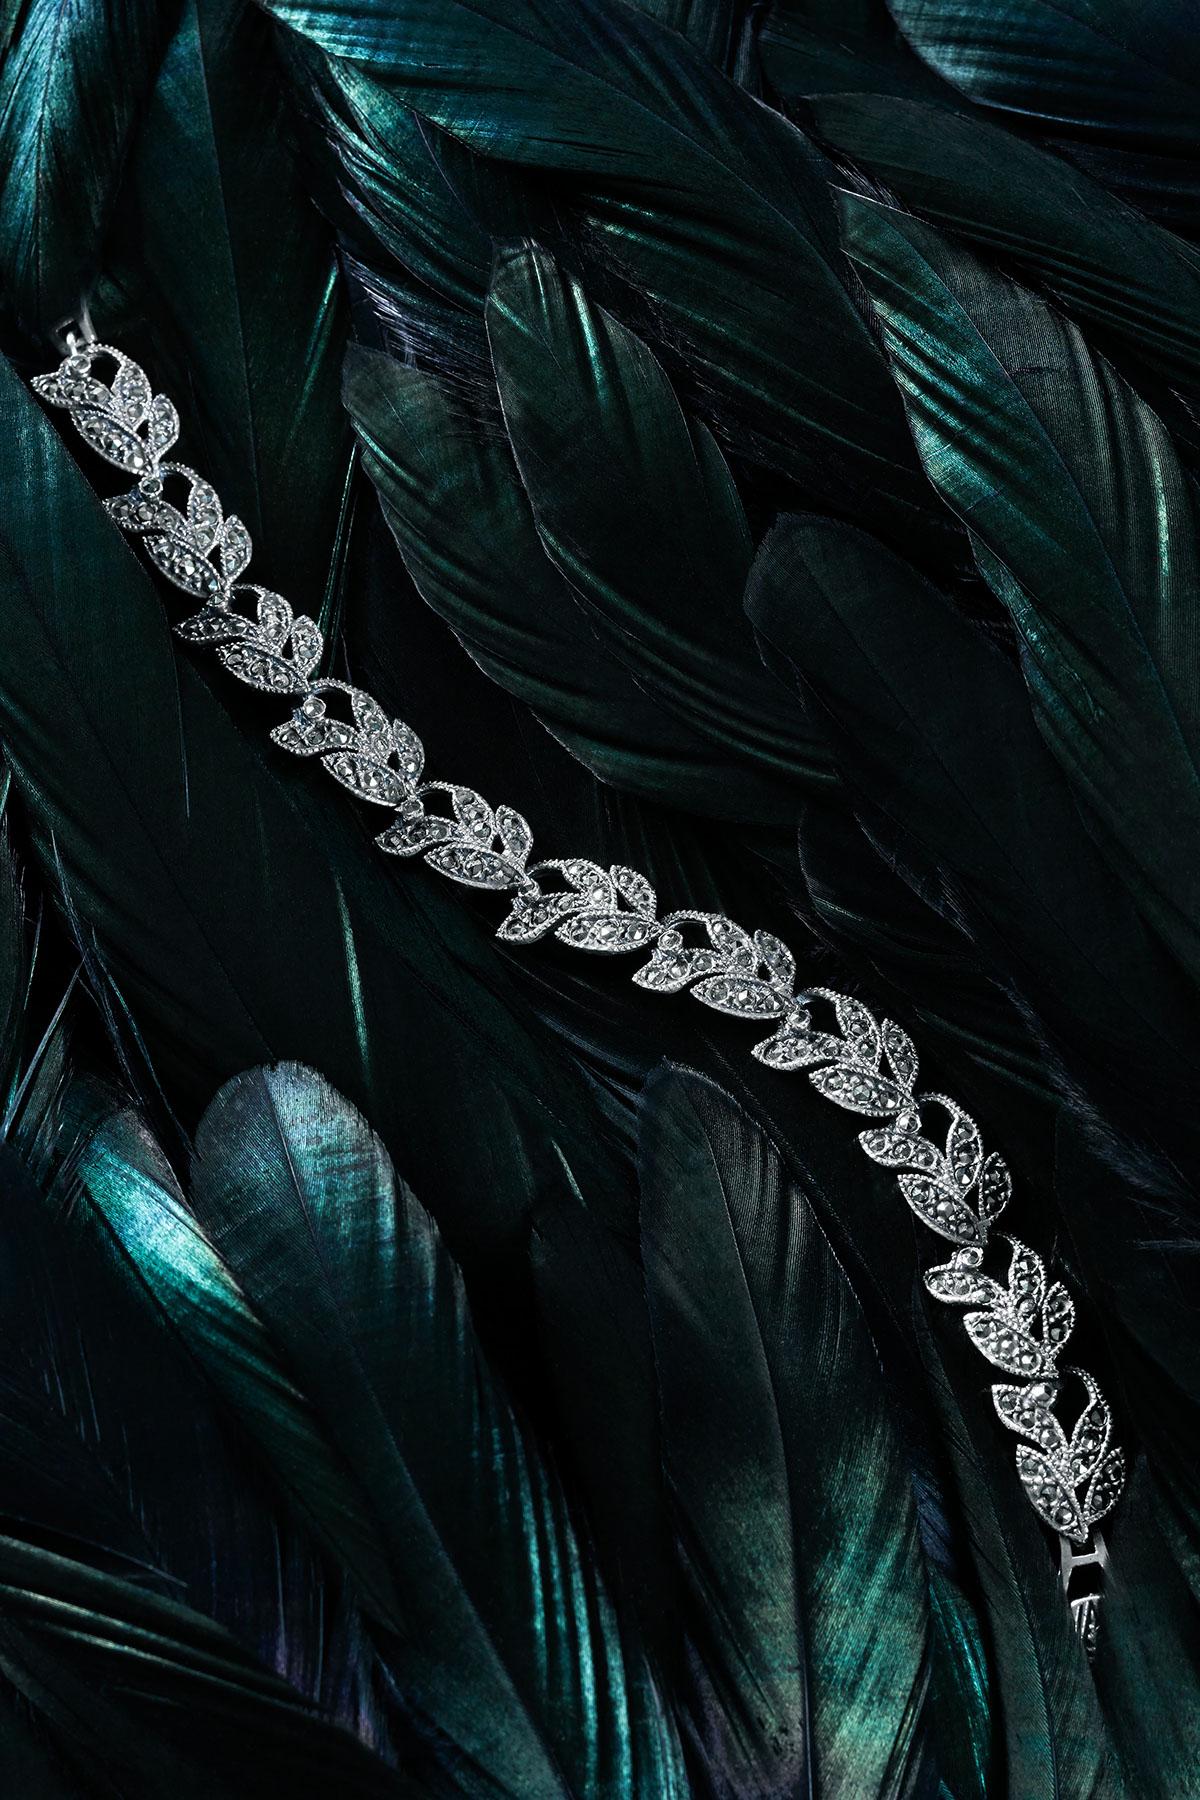 jewellery photography still life fine art Jewellery design blue green feathers